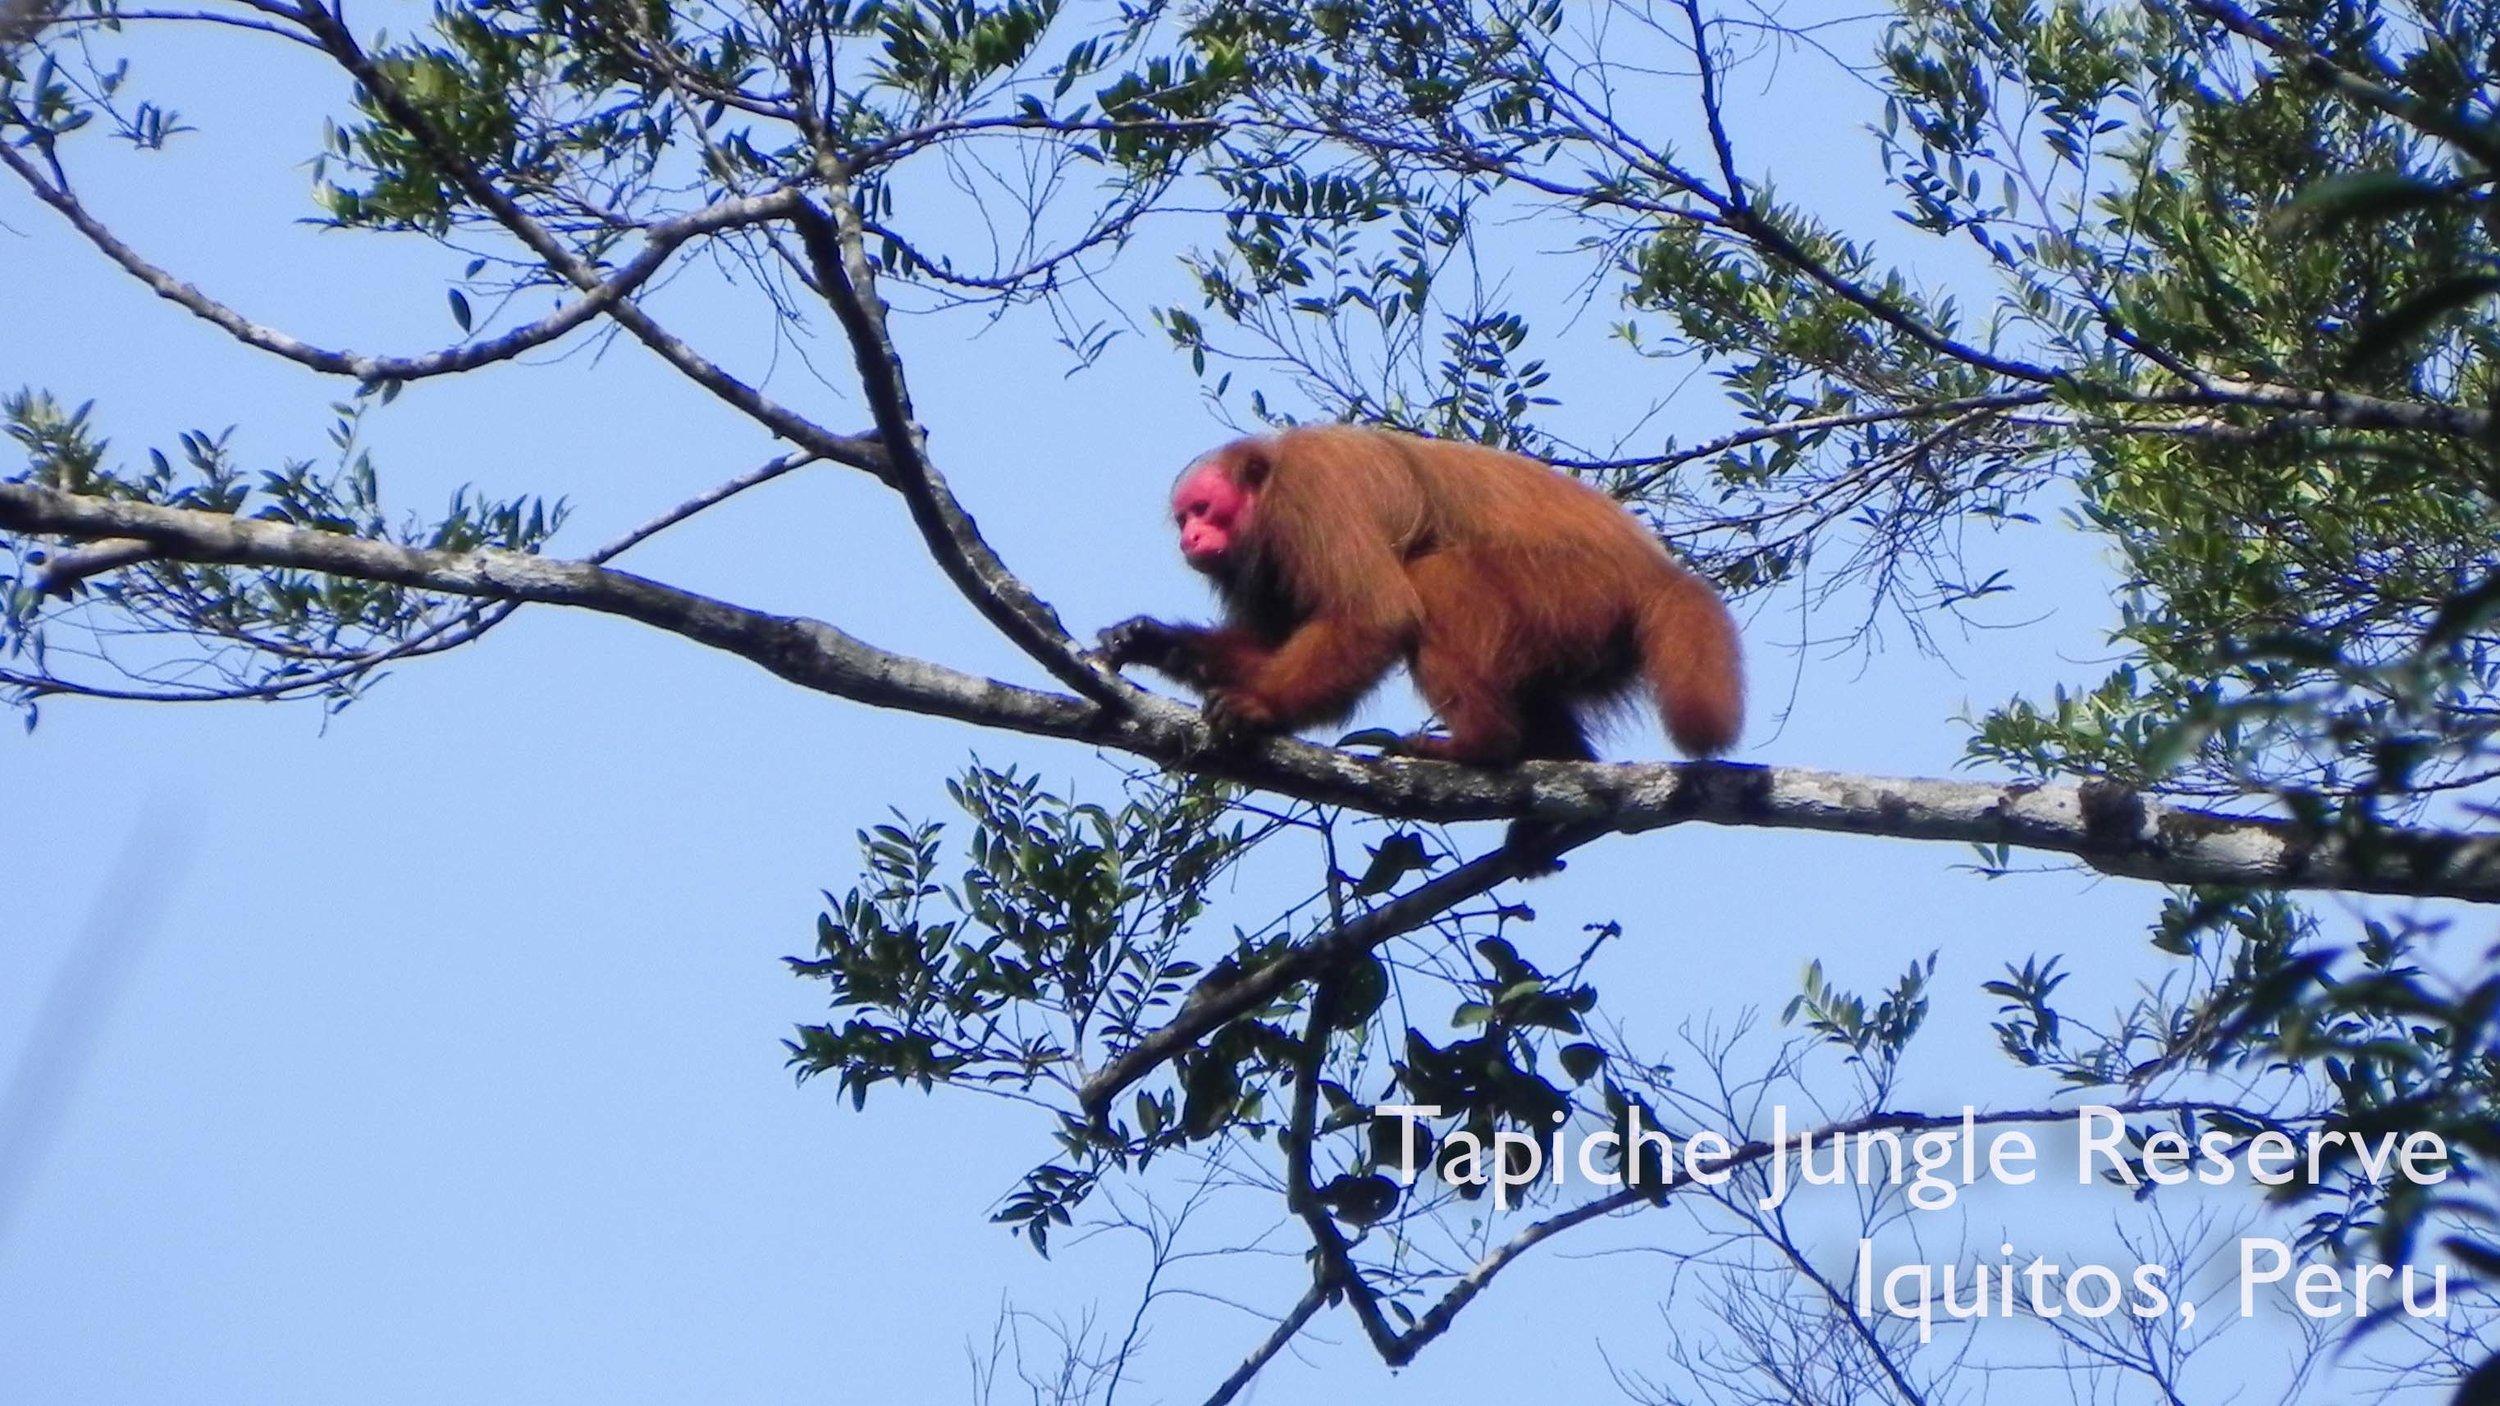 Tapiche-Amazon-Jungle-Tour-Peru-Red-Bald-Uakari-walking.jpg